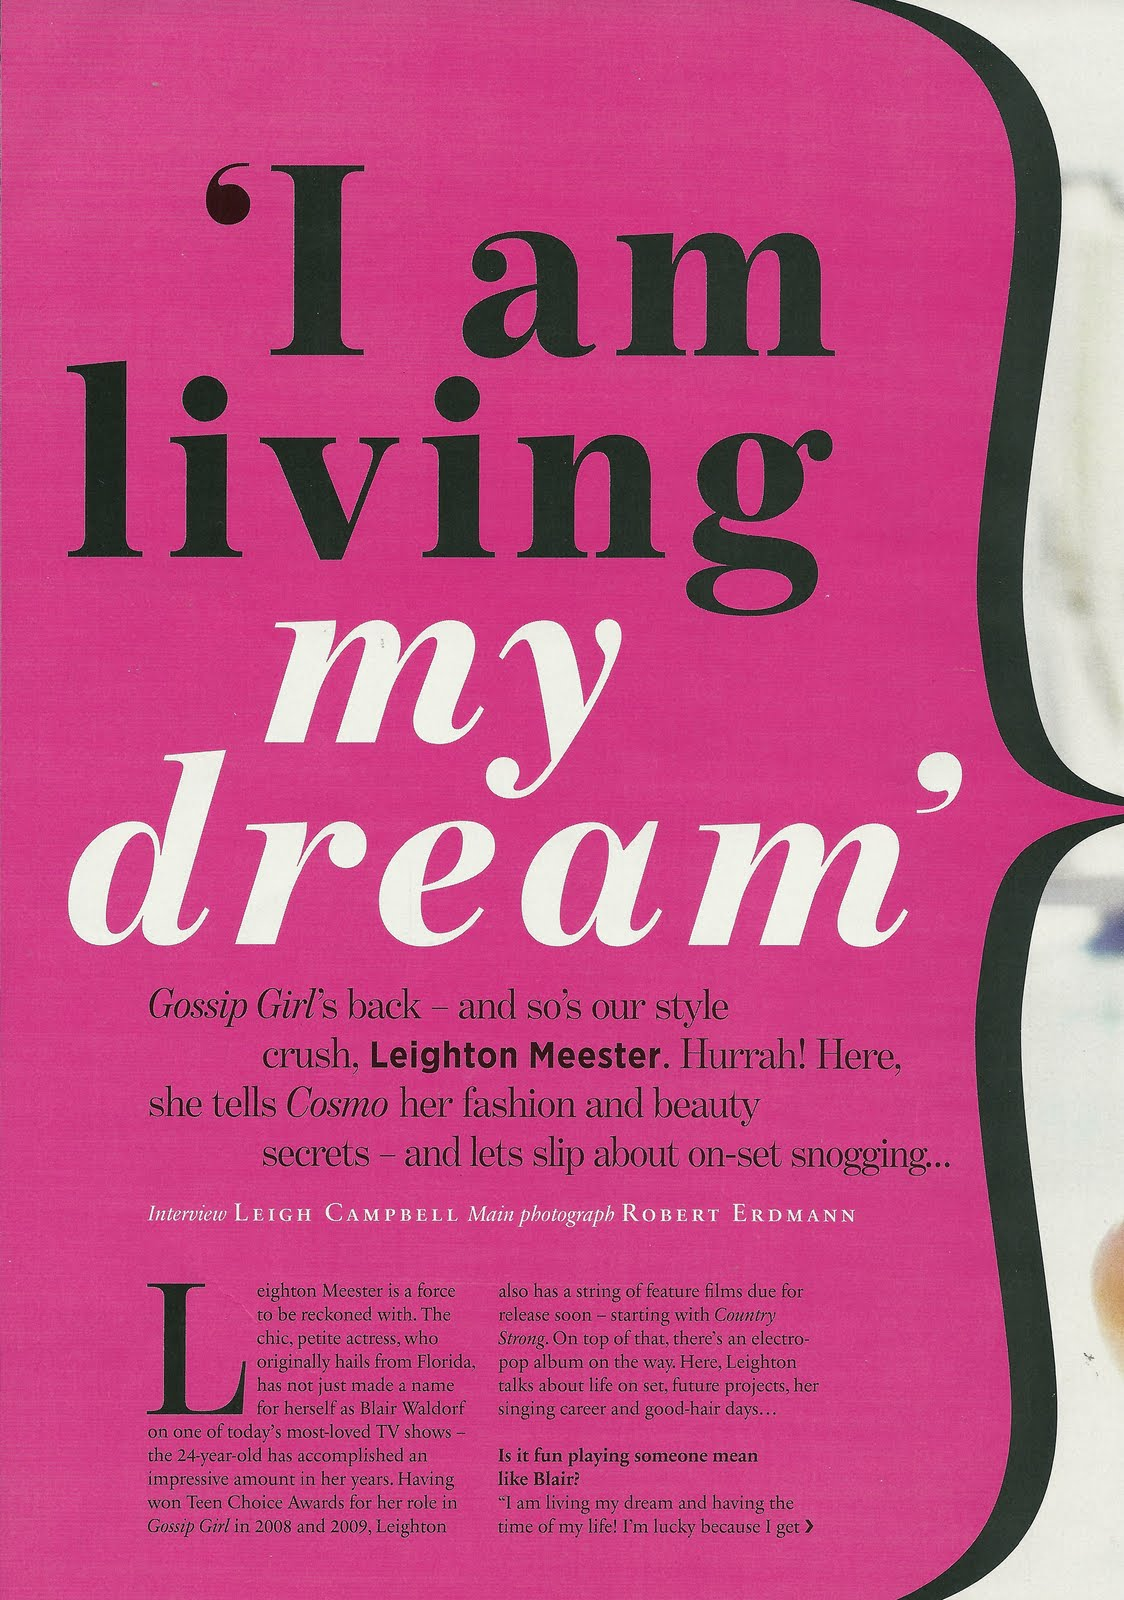 http://3.bp.blogspot.com/_HE0nu5g8bSw/TGxQ0Dpg6PI/AAAAAAAAAQs/7TFgoeMIYTw/s1600/Leighton_Meester_Cosmopolitan_September_2010+%285%29.jpg